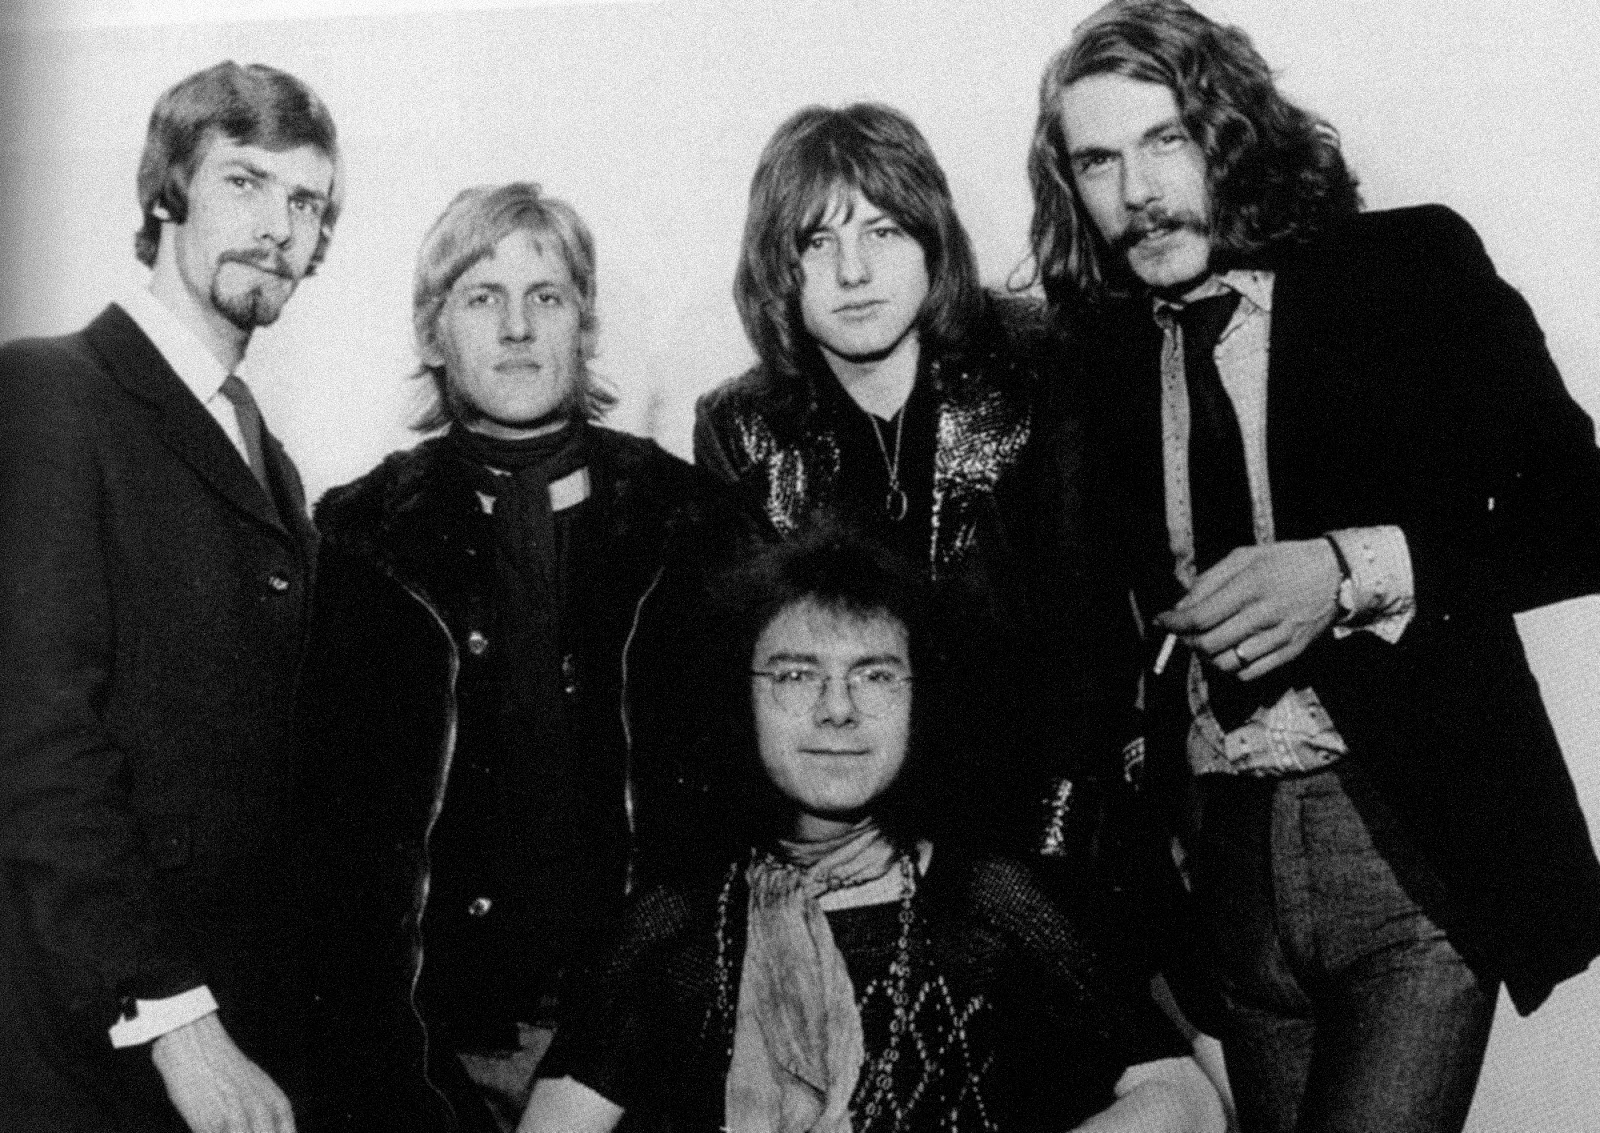 King Crimson: un post musicale